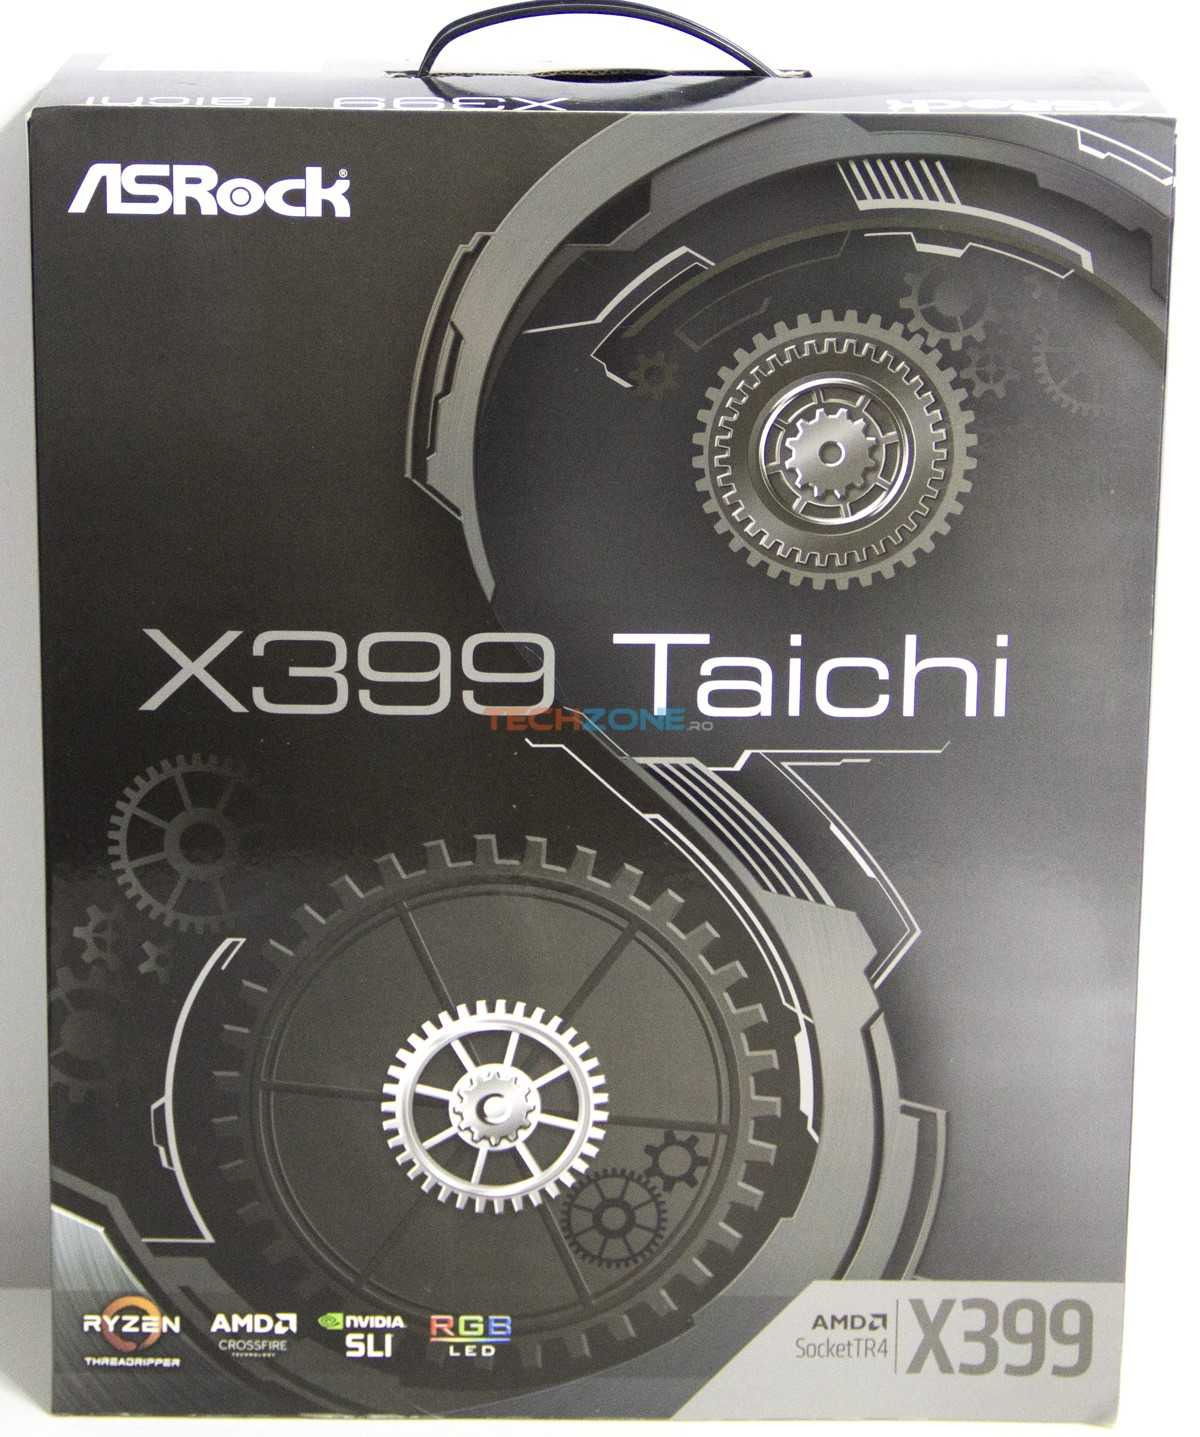 ASRock X399 Taichi set